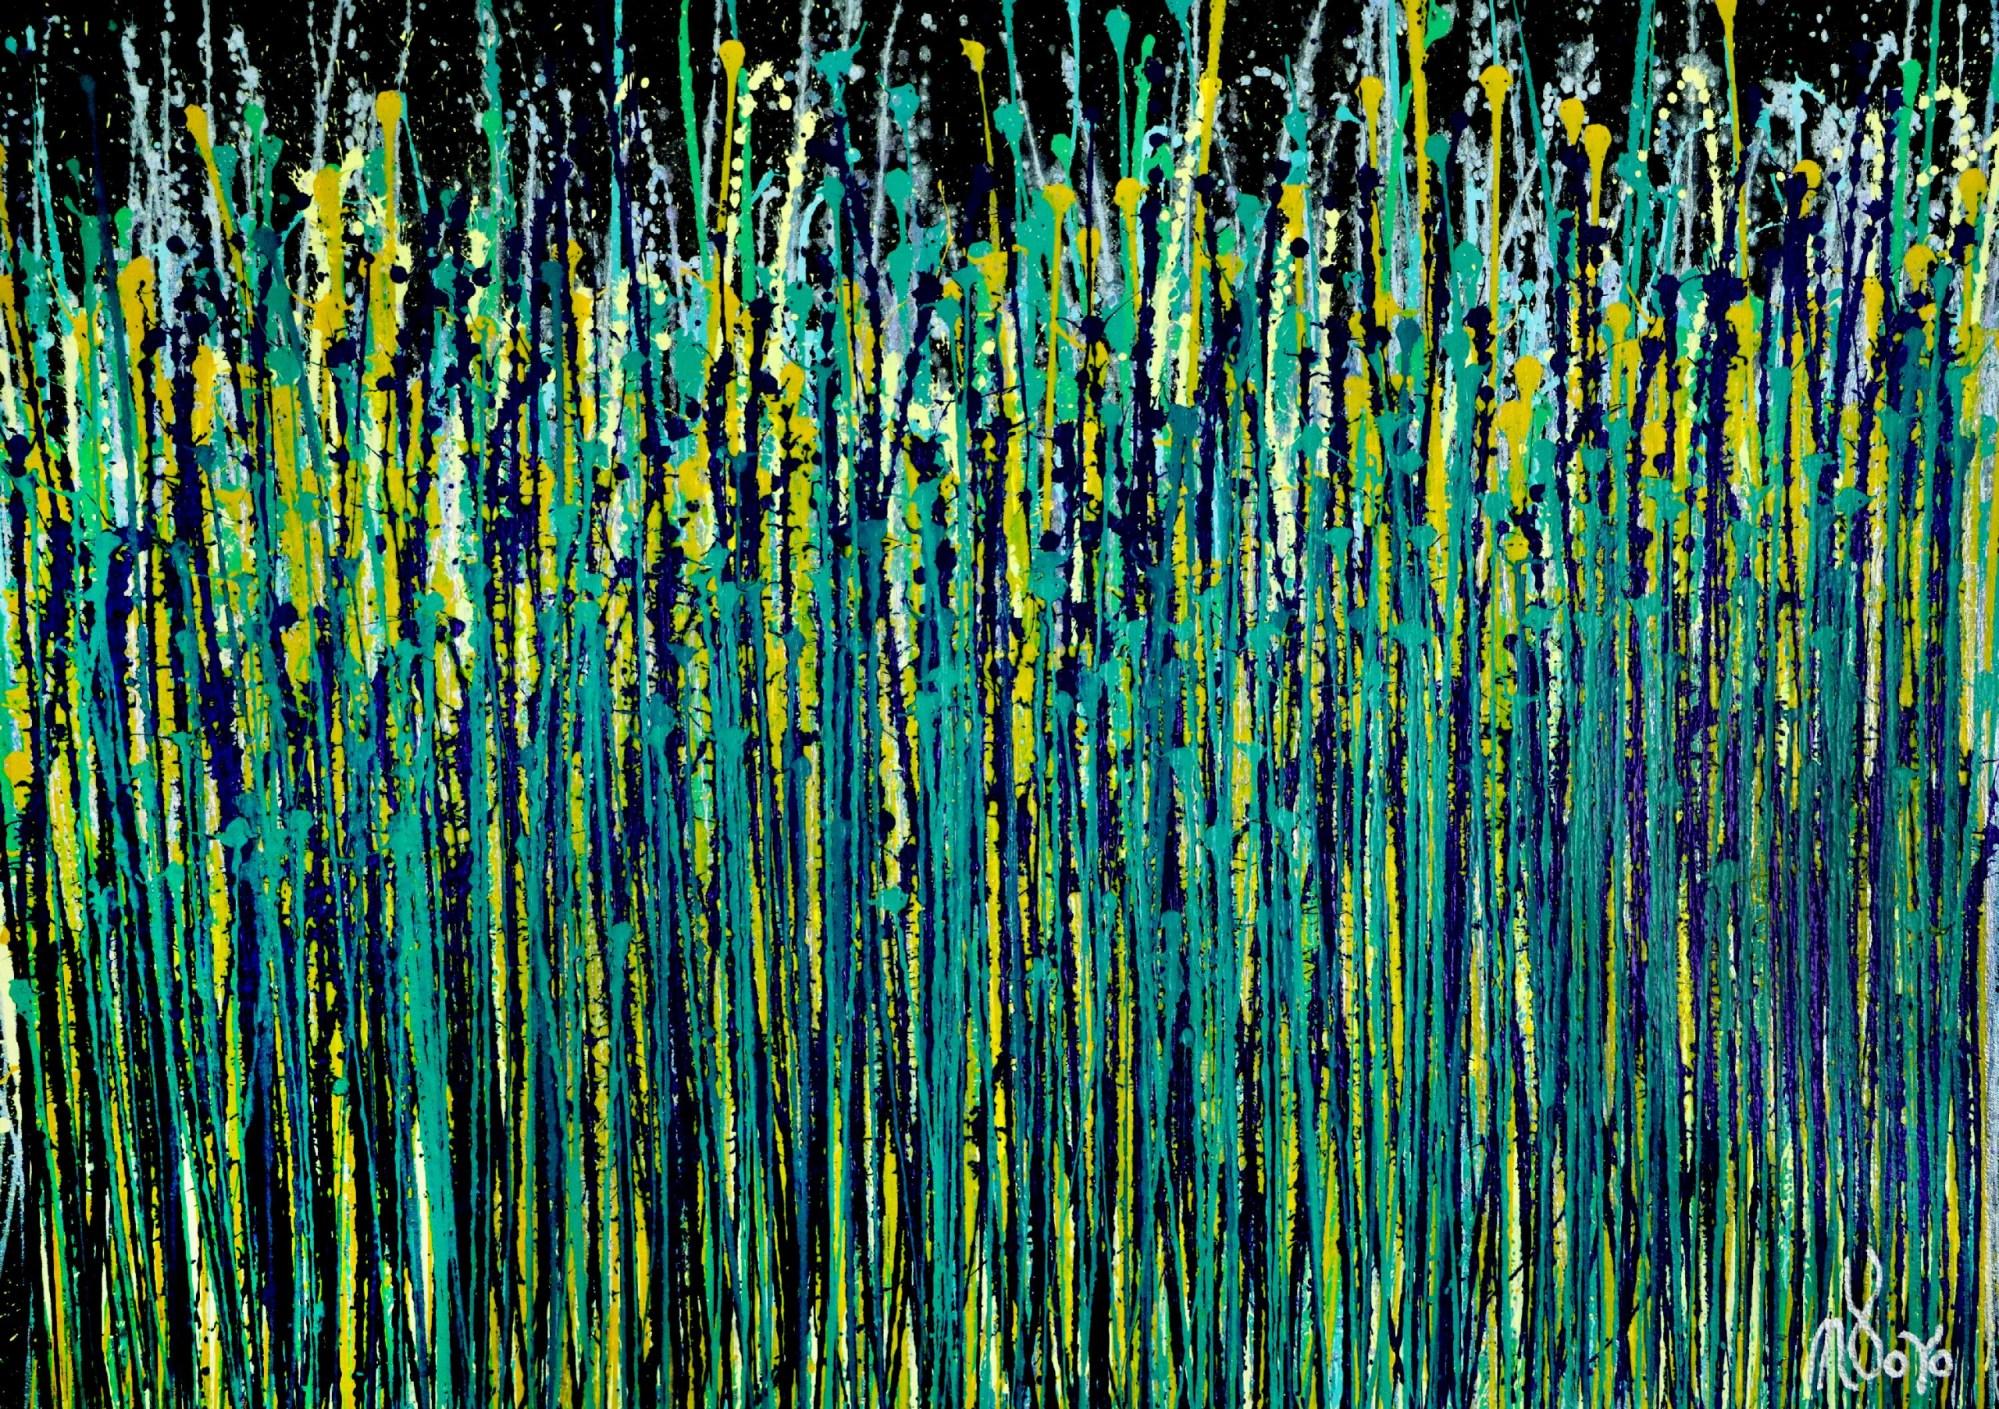 Shimmer and breeze garden 2 (2020) by Nestor Toro